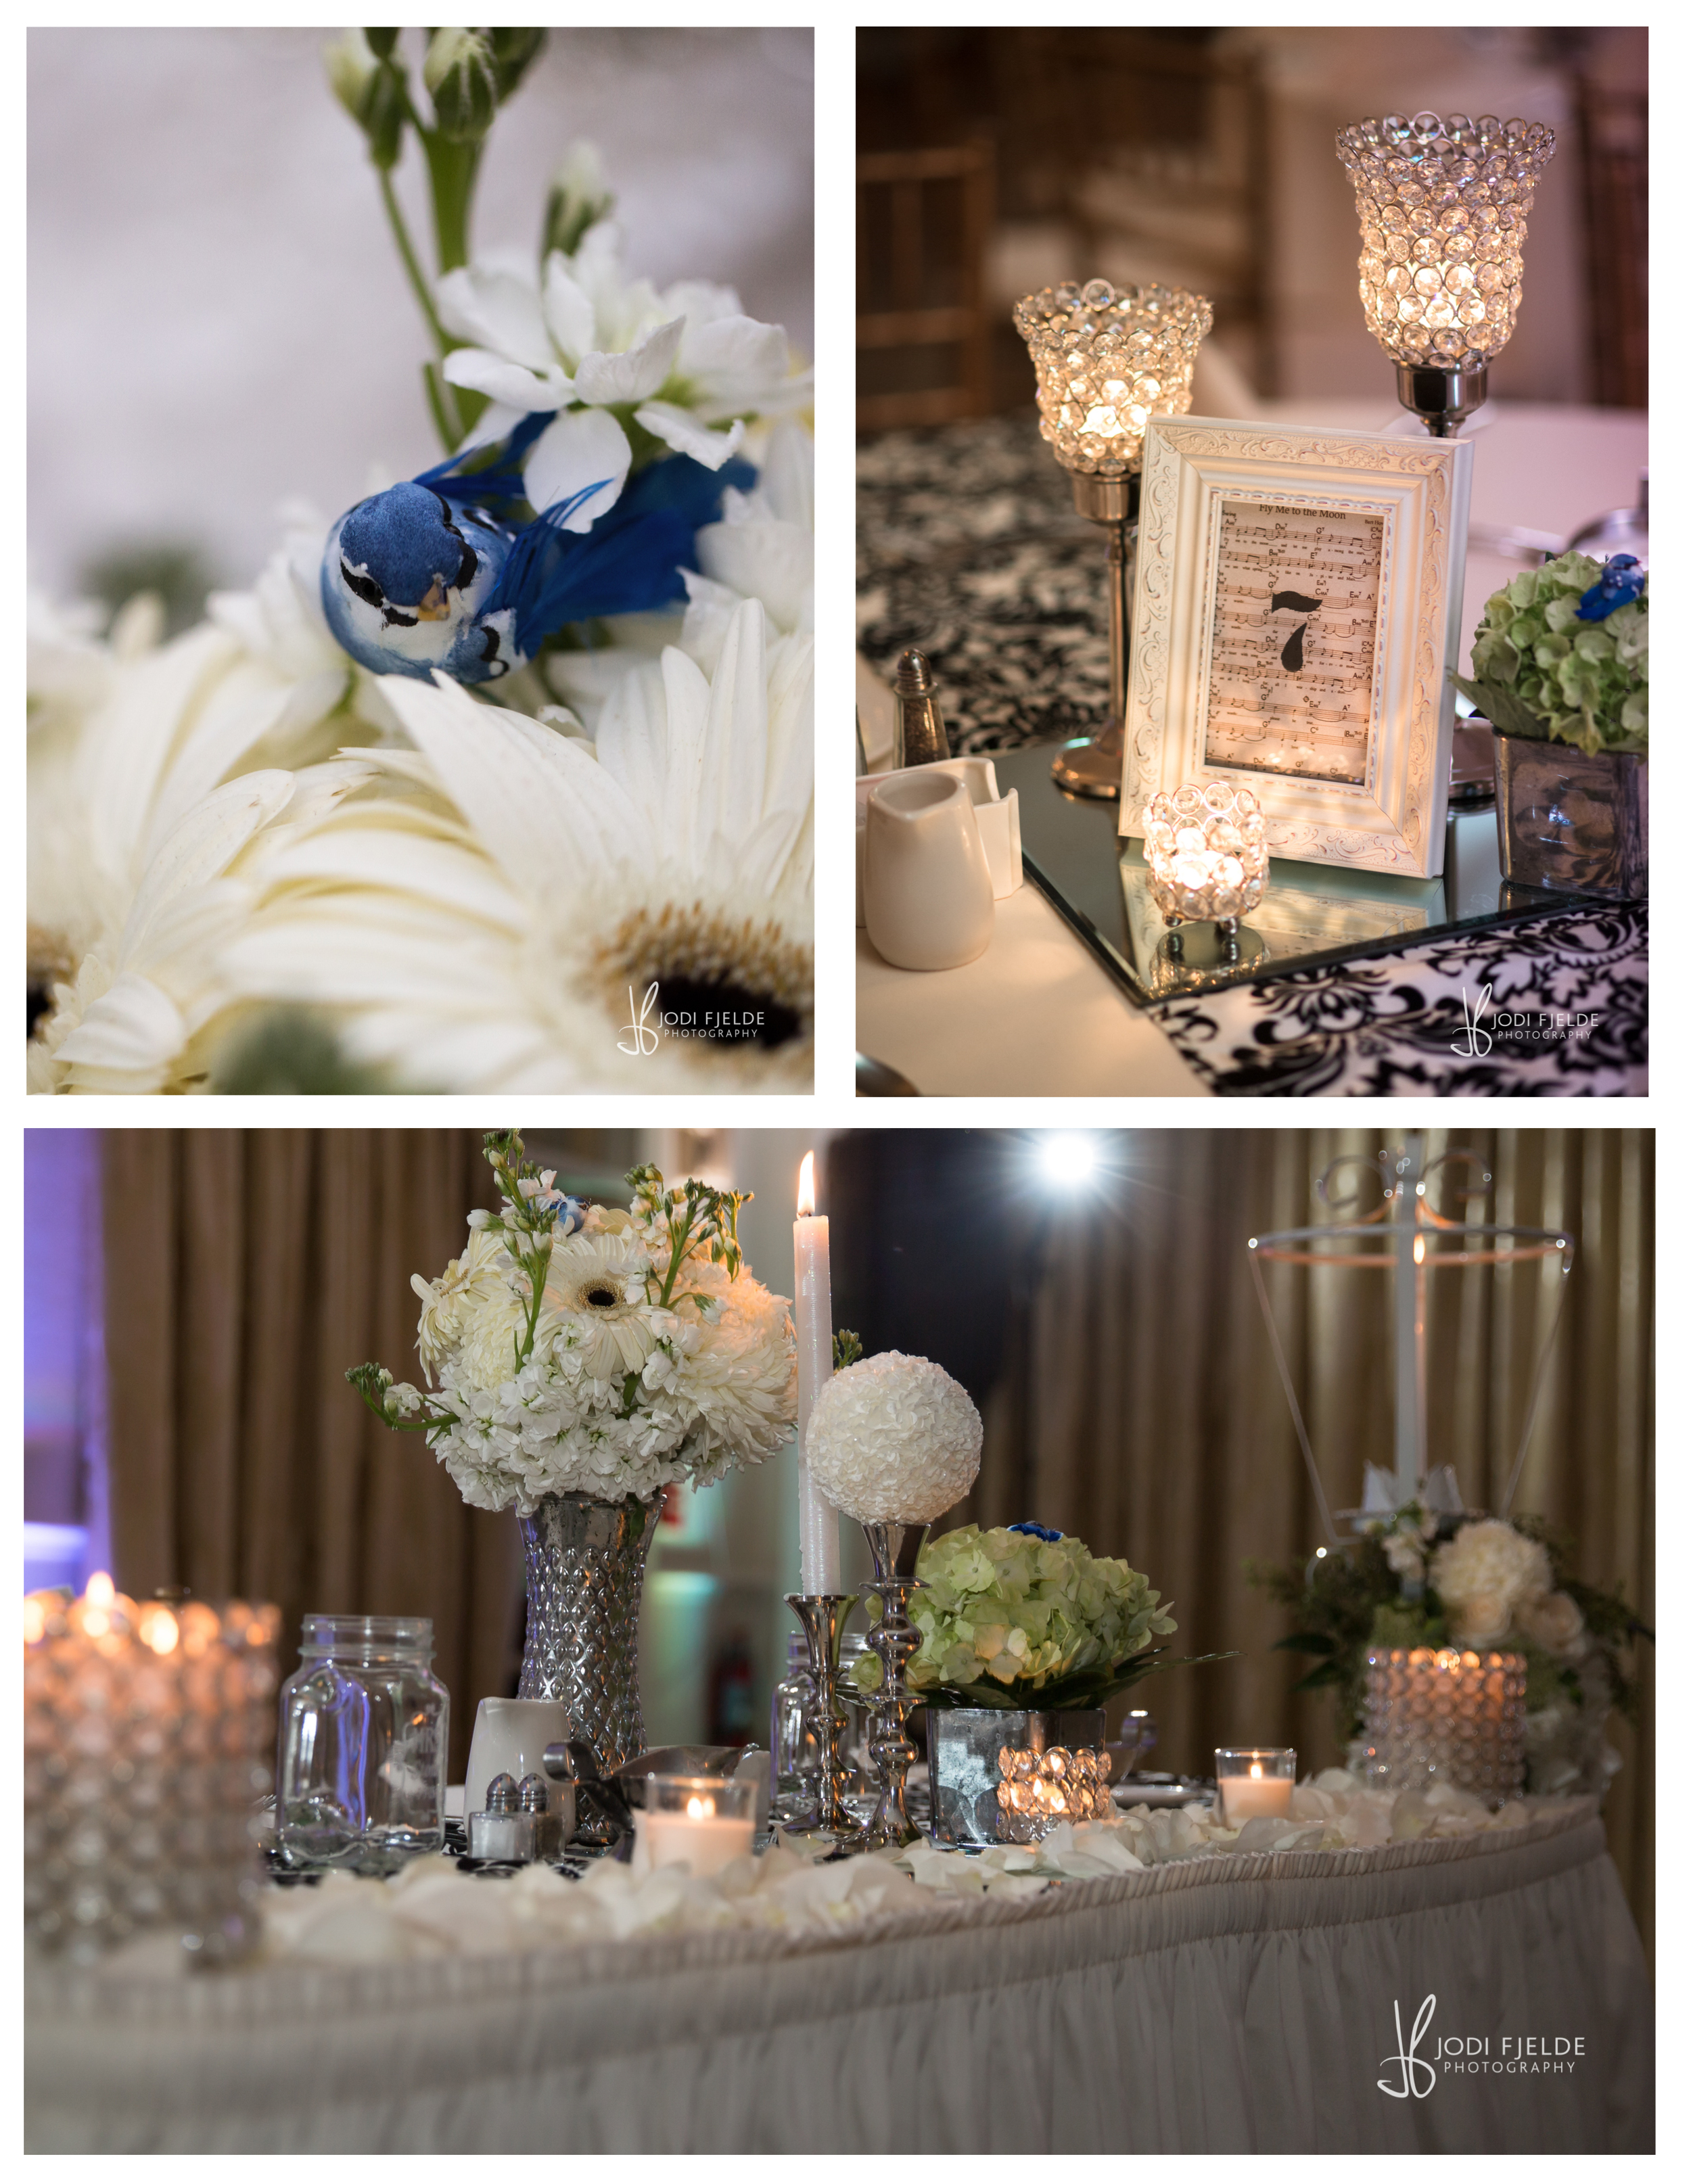 Highland_Manor_Apopka_Florida_wedding_Jackie_&_Tim_photography_jodi_Fjelde_photography-41.jpg